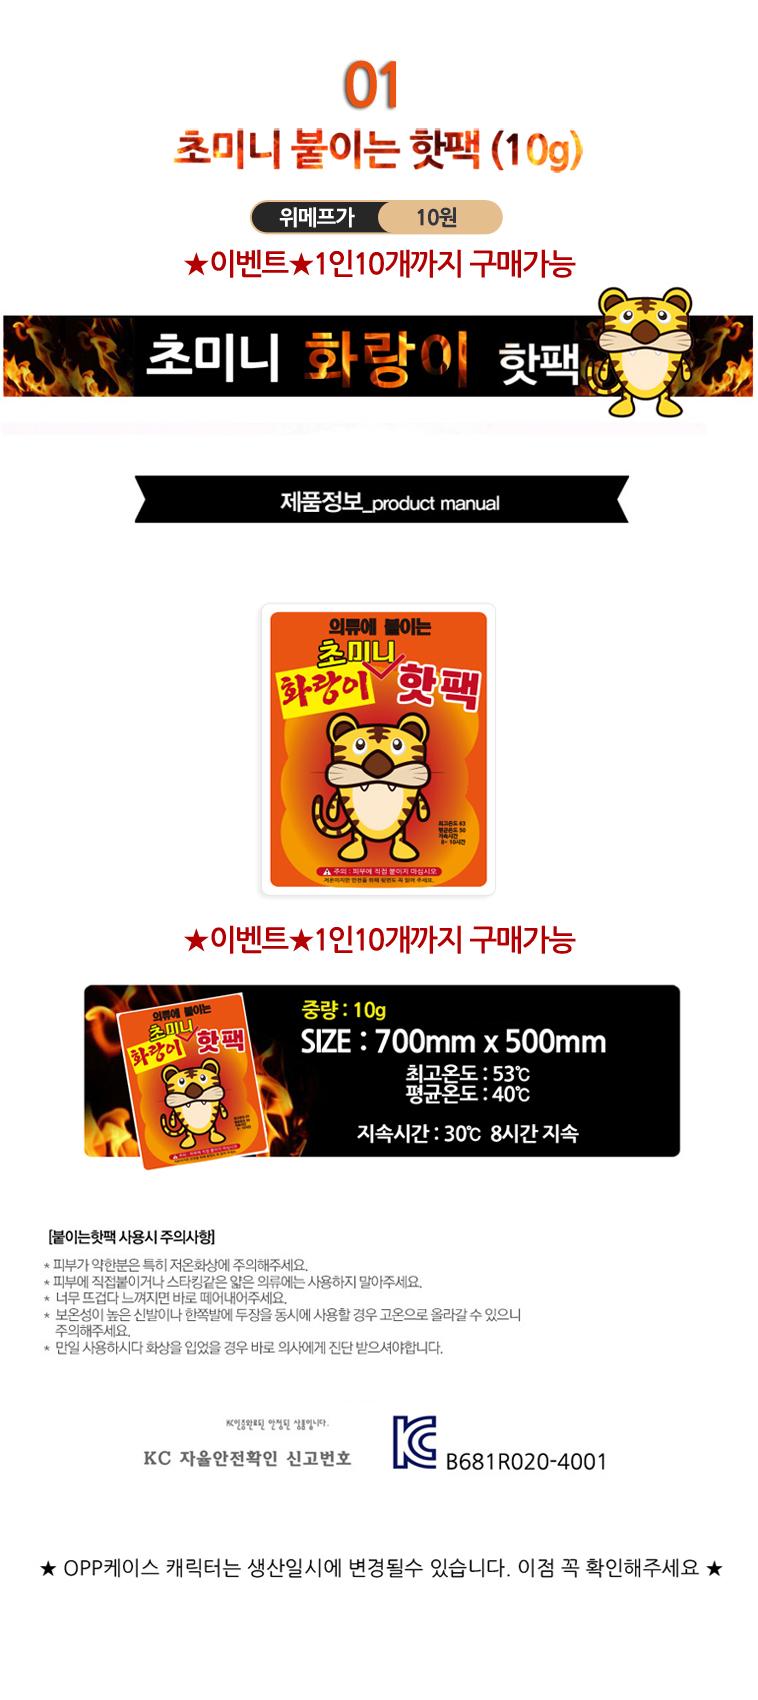 KC인증 화랑이 핫팩!! - 상세정보